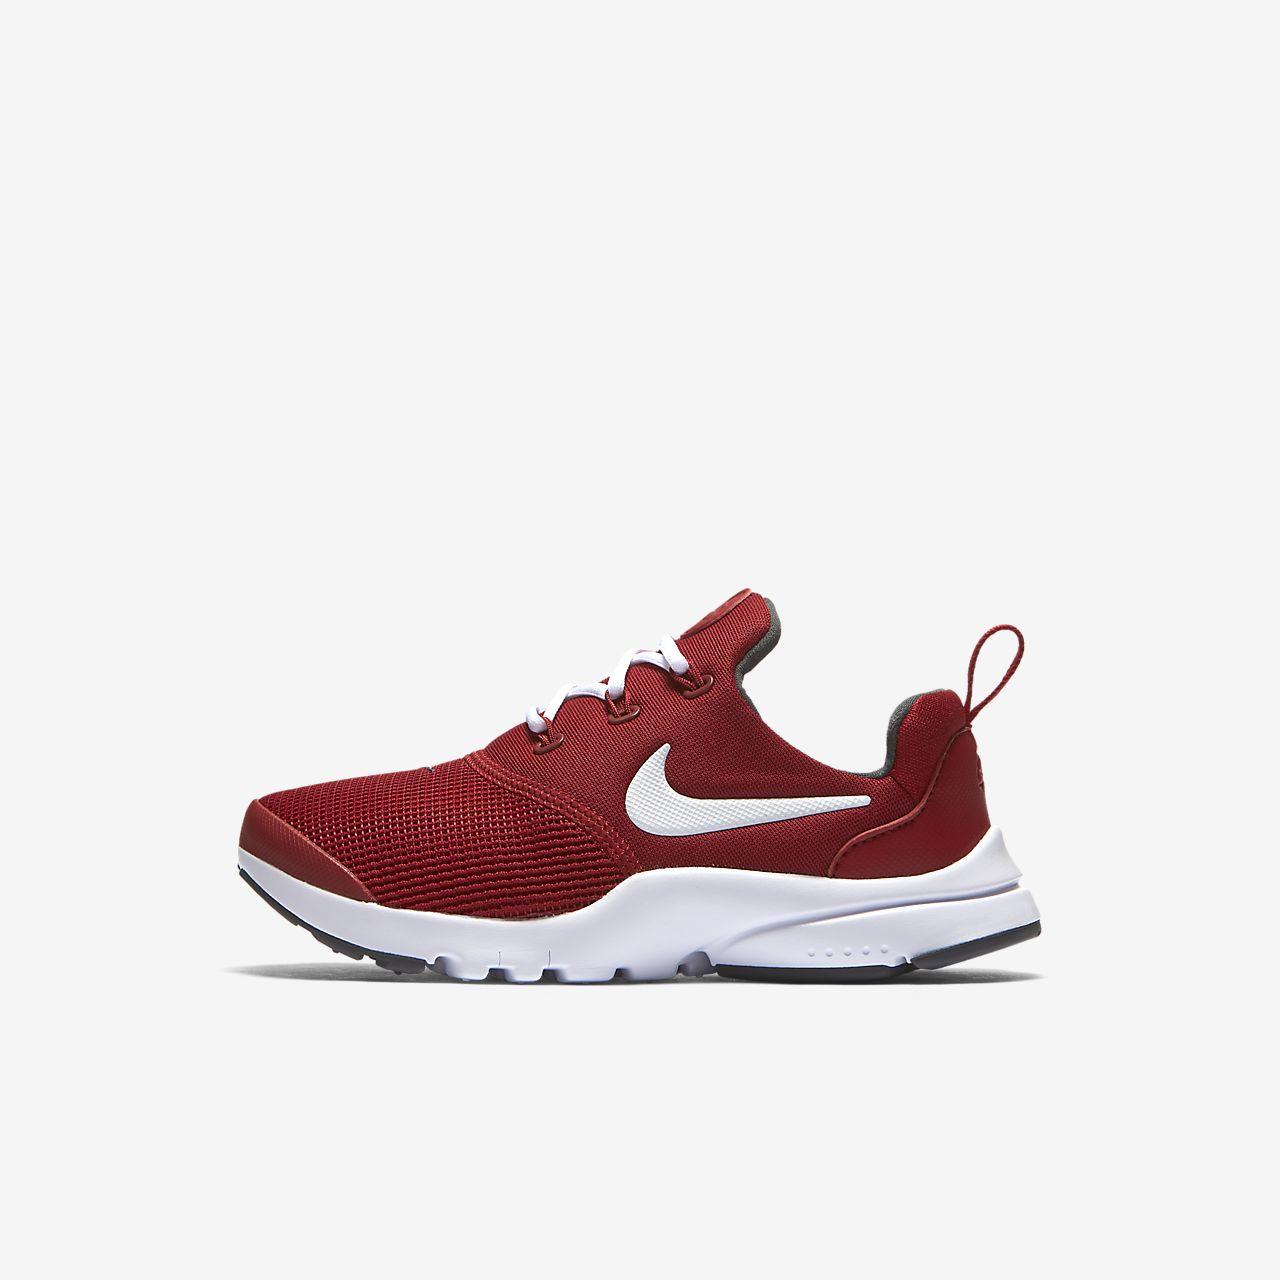 Nike Sportswear PRESTO FLY SE - Trainers - gym red/white 4UX586